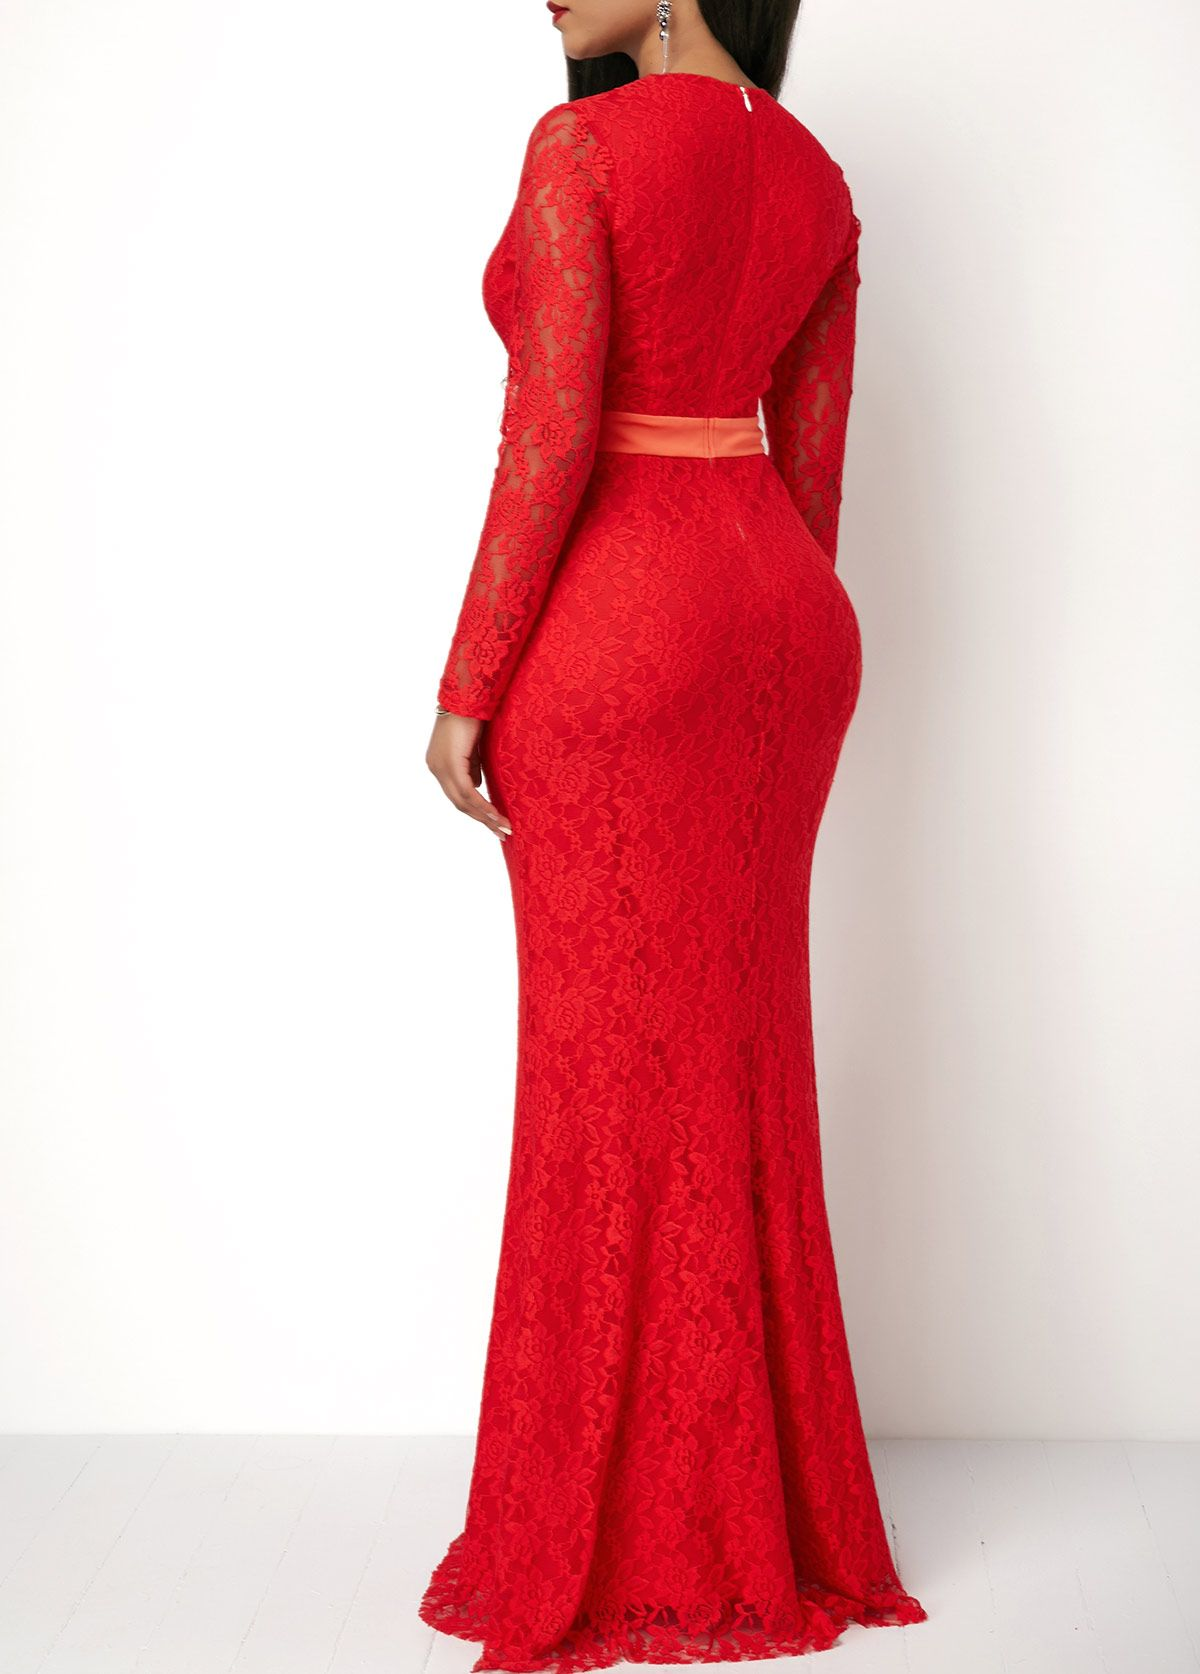 Zipper back long sleeve v neck lace dress womenus apparel